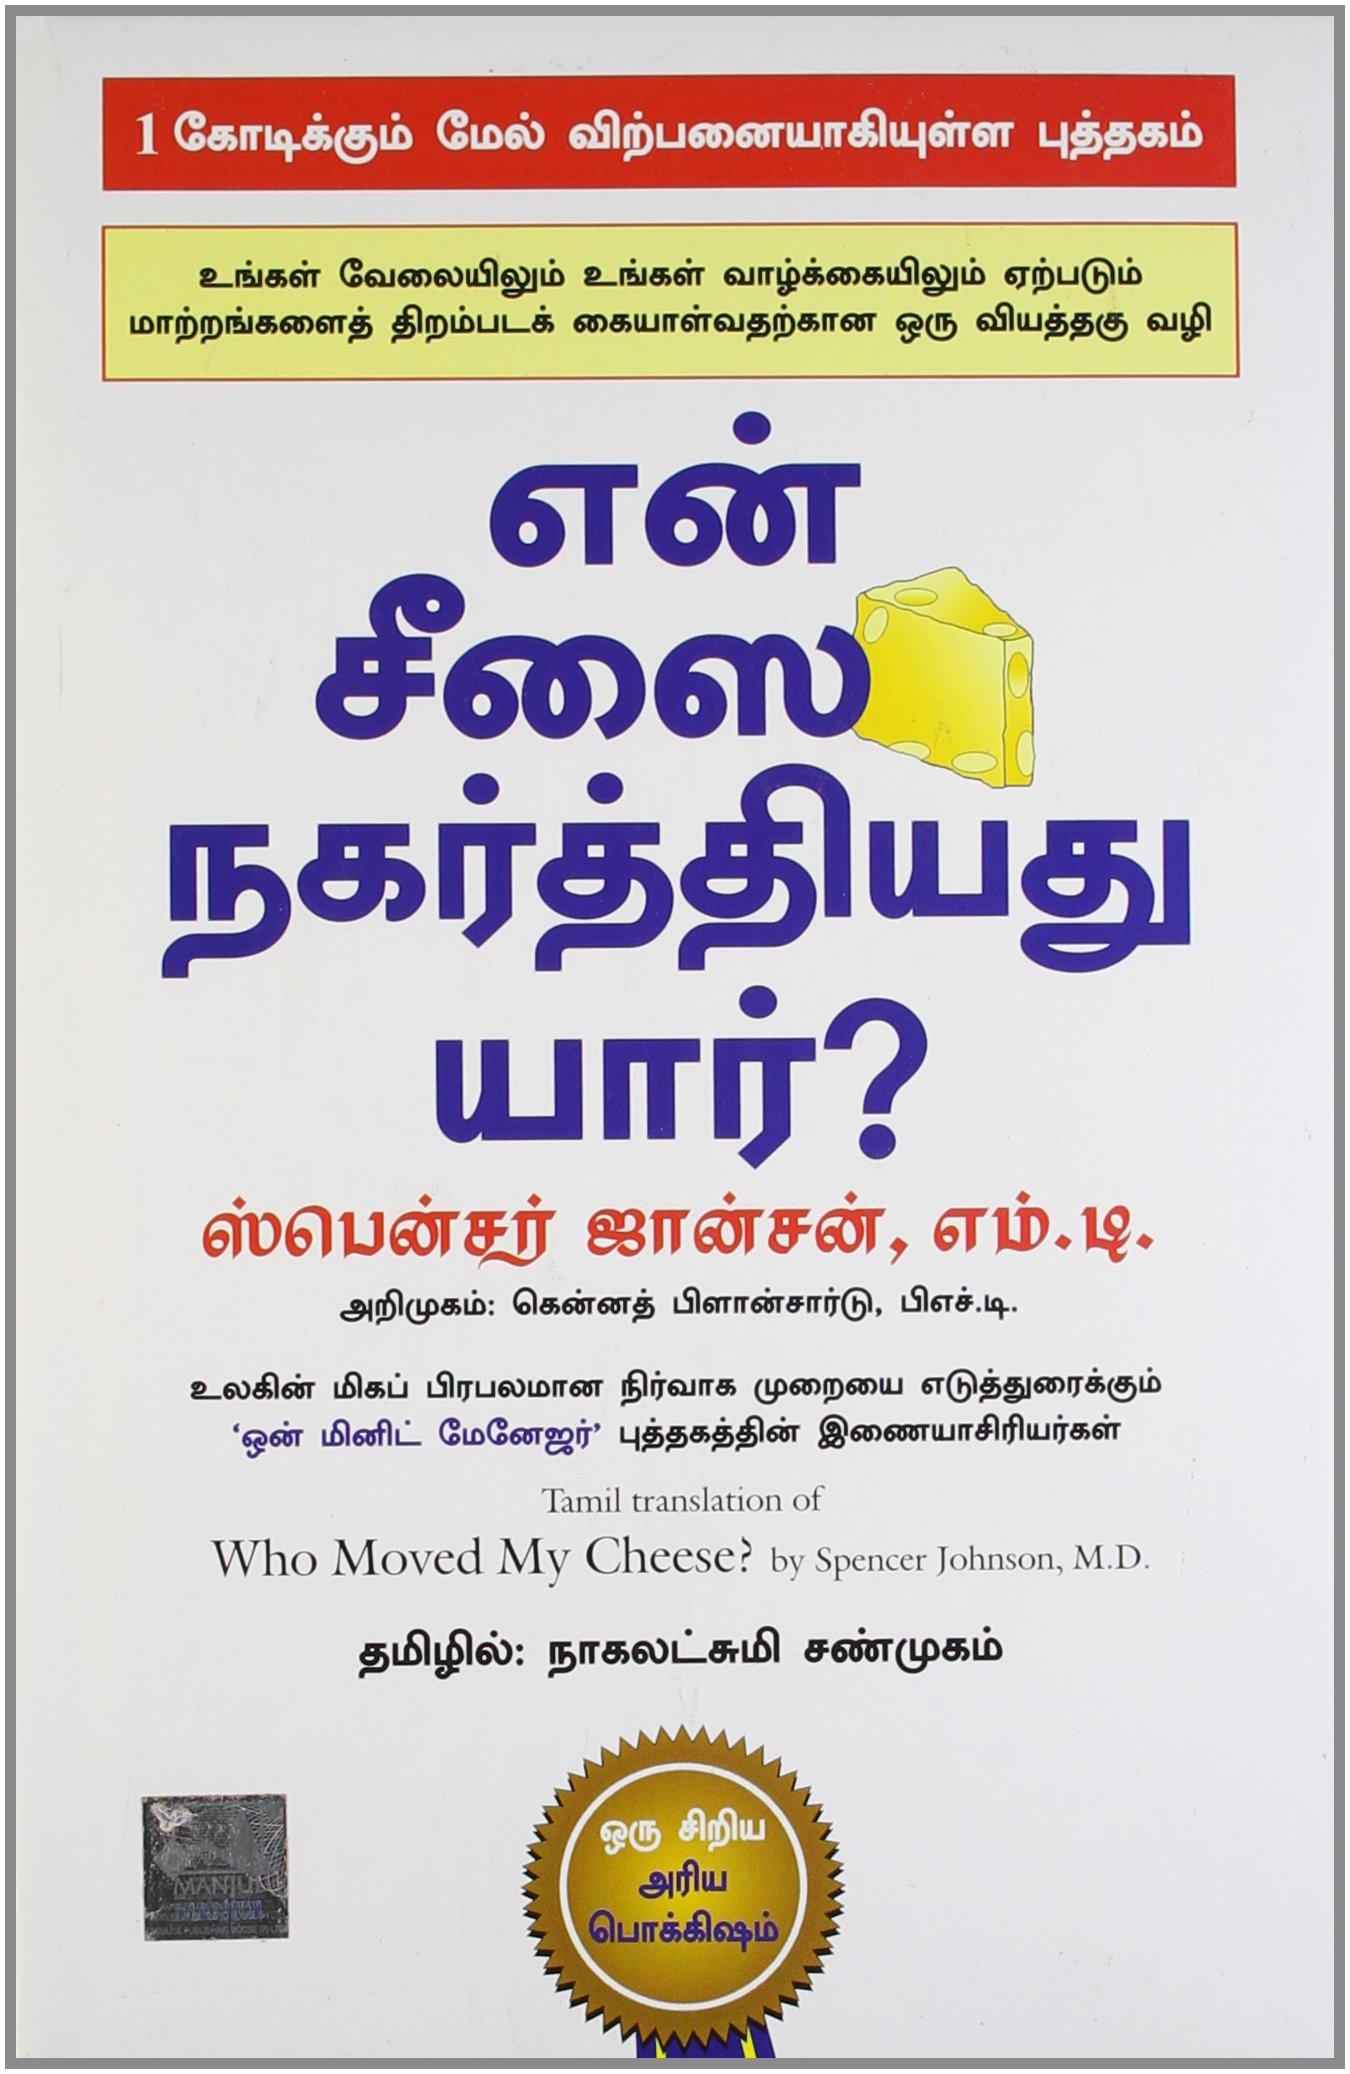 Buy yen cheesai nagarthiyadhu yaar tamil who moved my cheese buy yen cheesai nagarthiyadhu yaar tamil who moved my cheese book online at low prices in india yen cheesai nagarthiyadhu yaar tamil who moved my fandeluxe Image collections